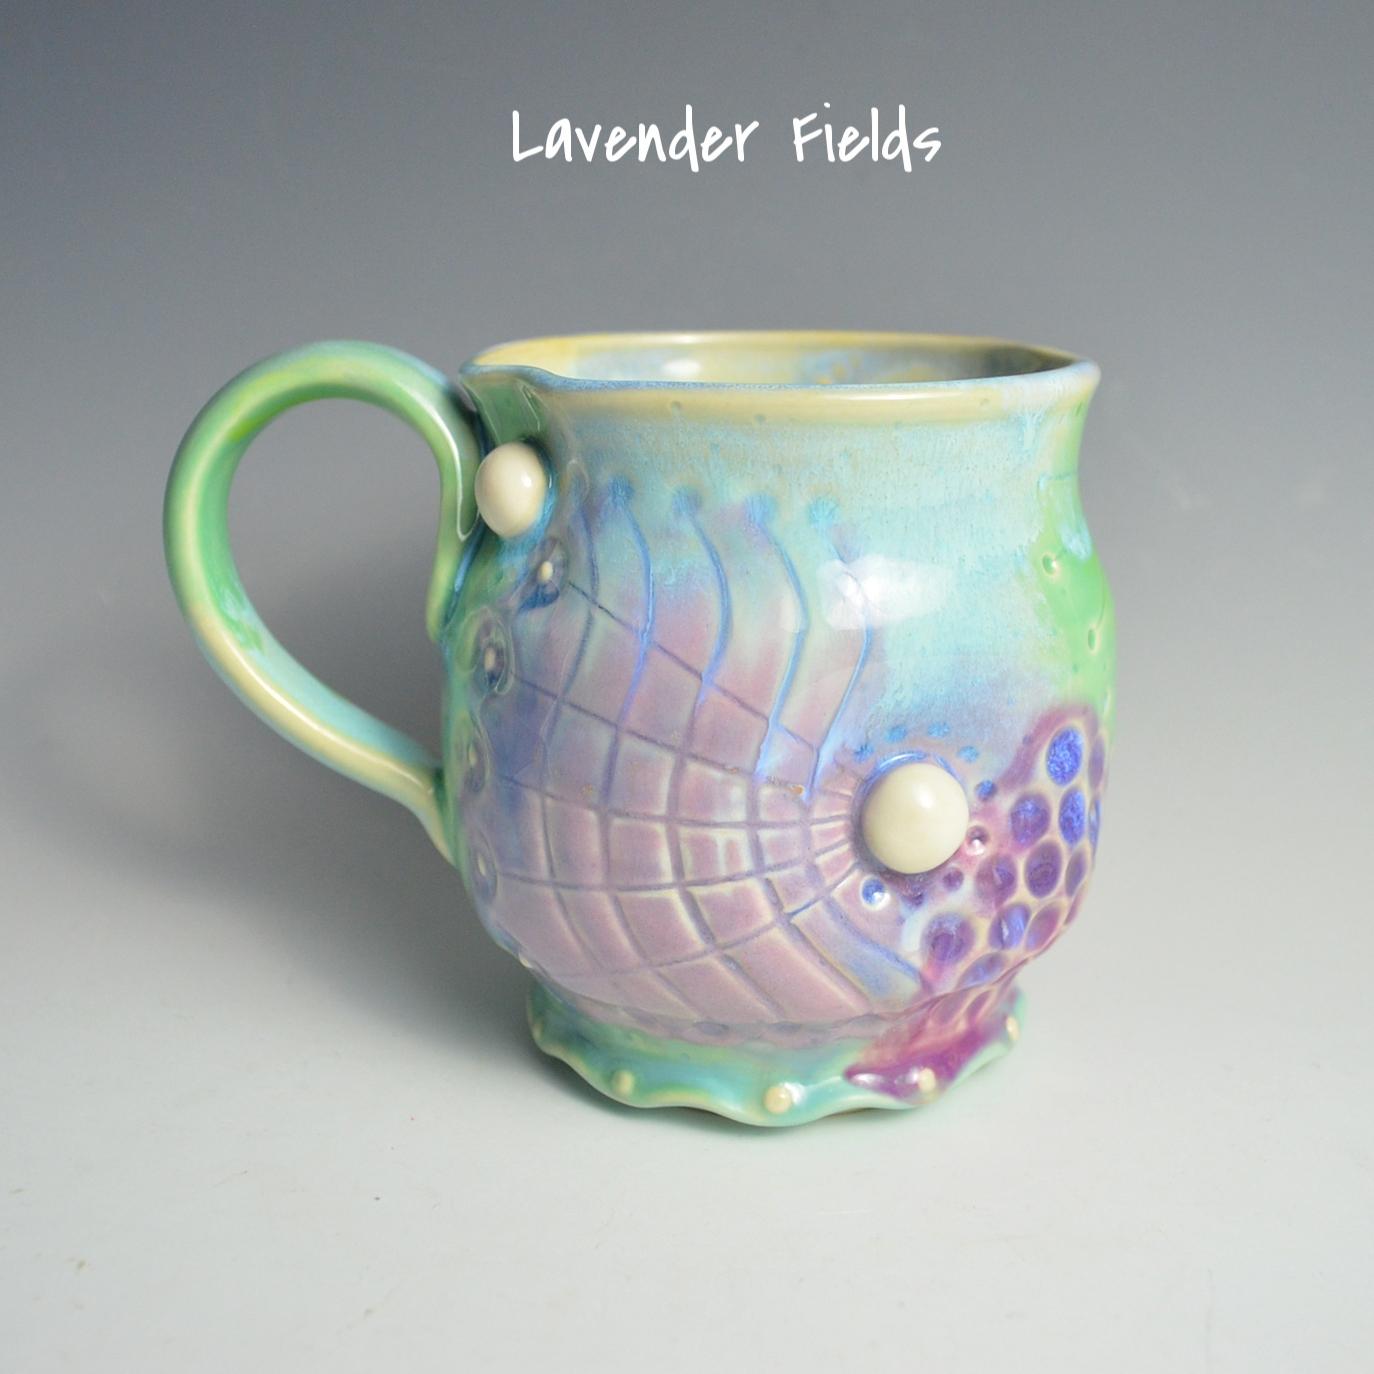 2671 - #1 Lavender Fields.JPG